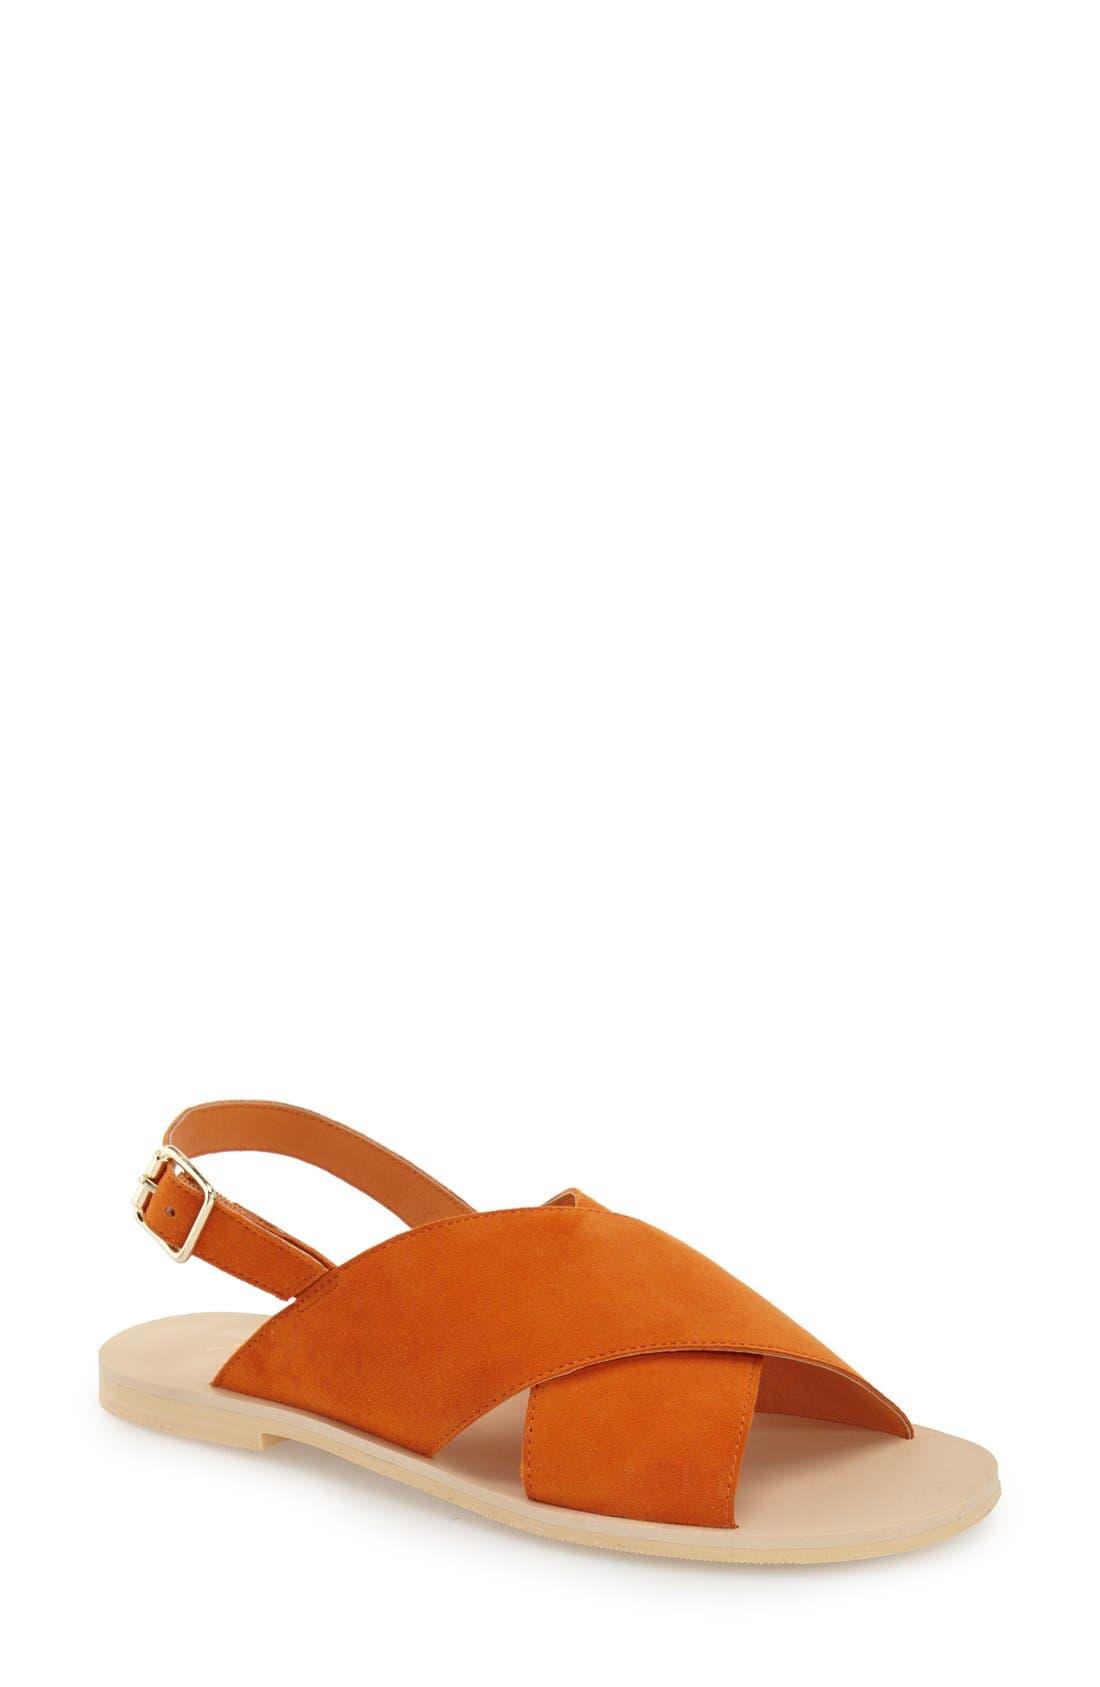 Alternate Image 1 Selected - Matisse 'Arielle' Slingback Sandal (Women)